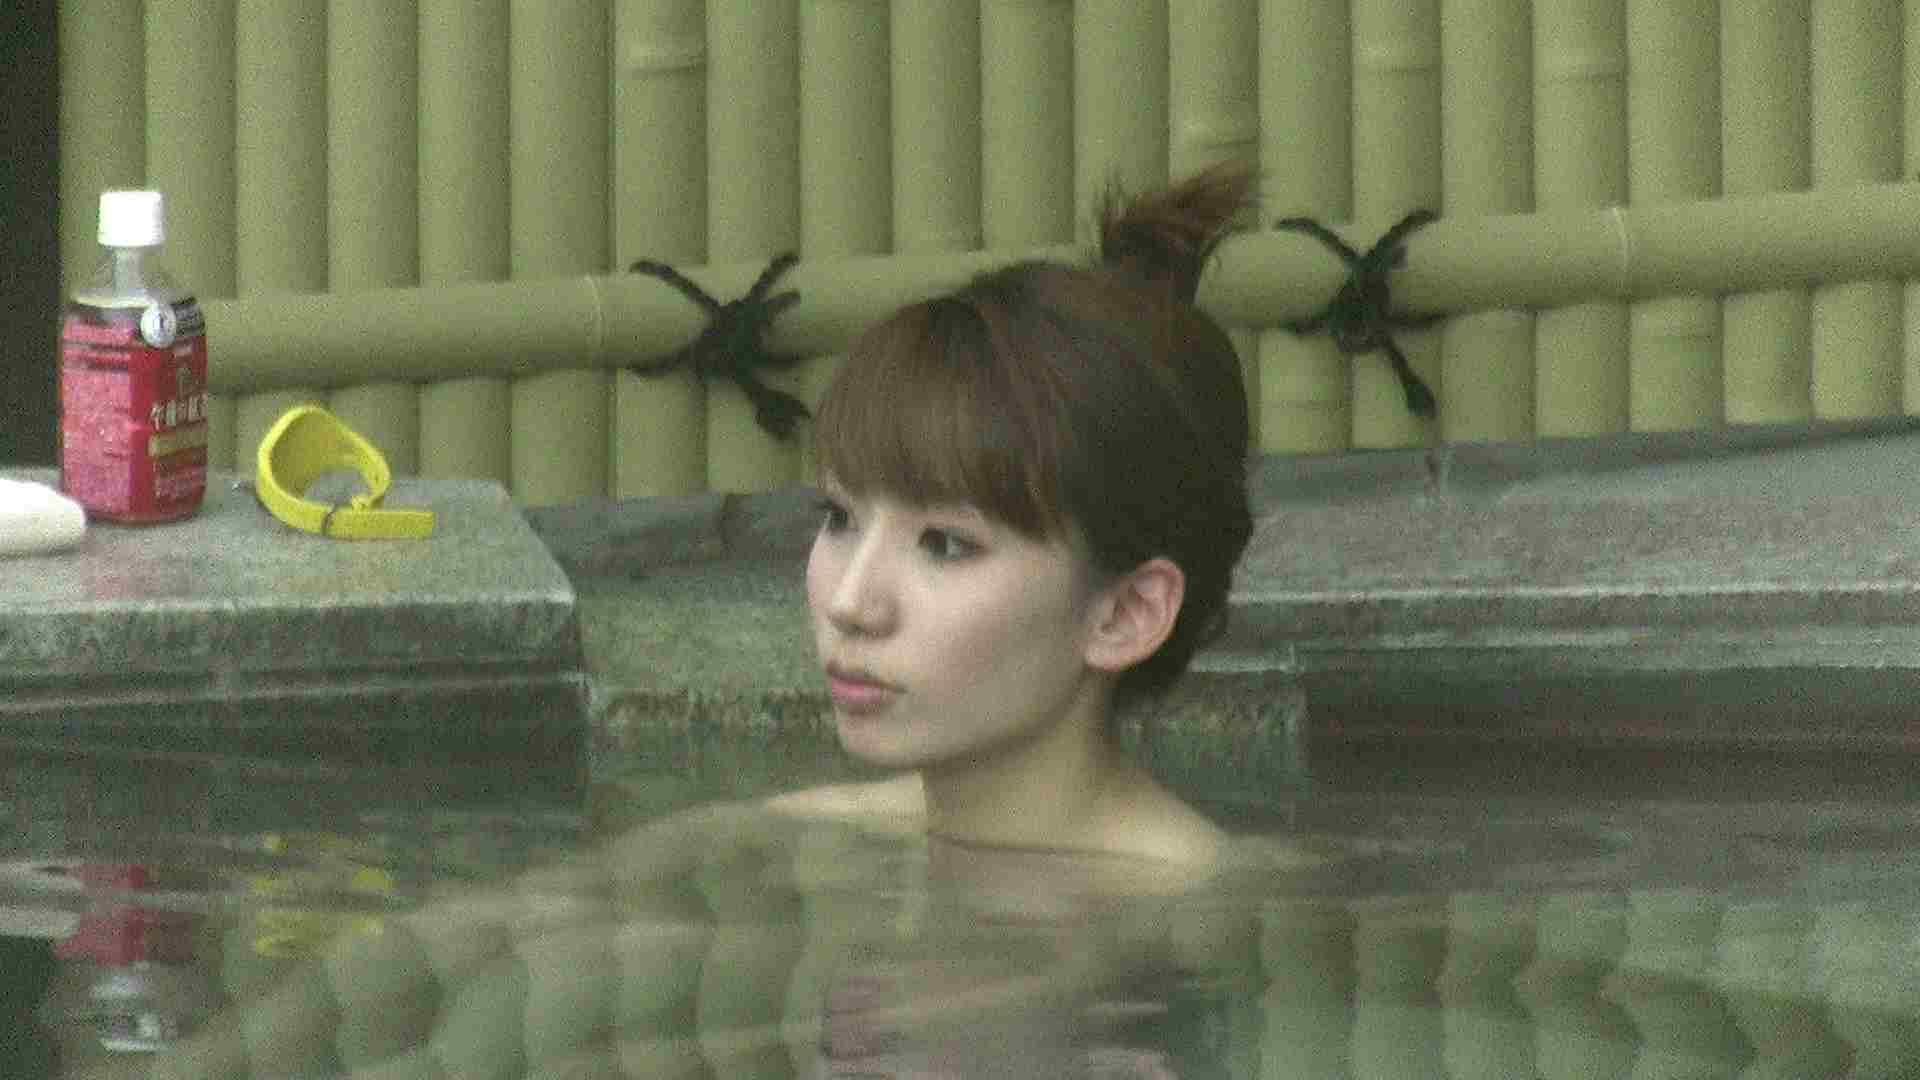 Aquaな露天風呂Vol.208 OLセックス  85画像 30